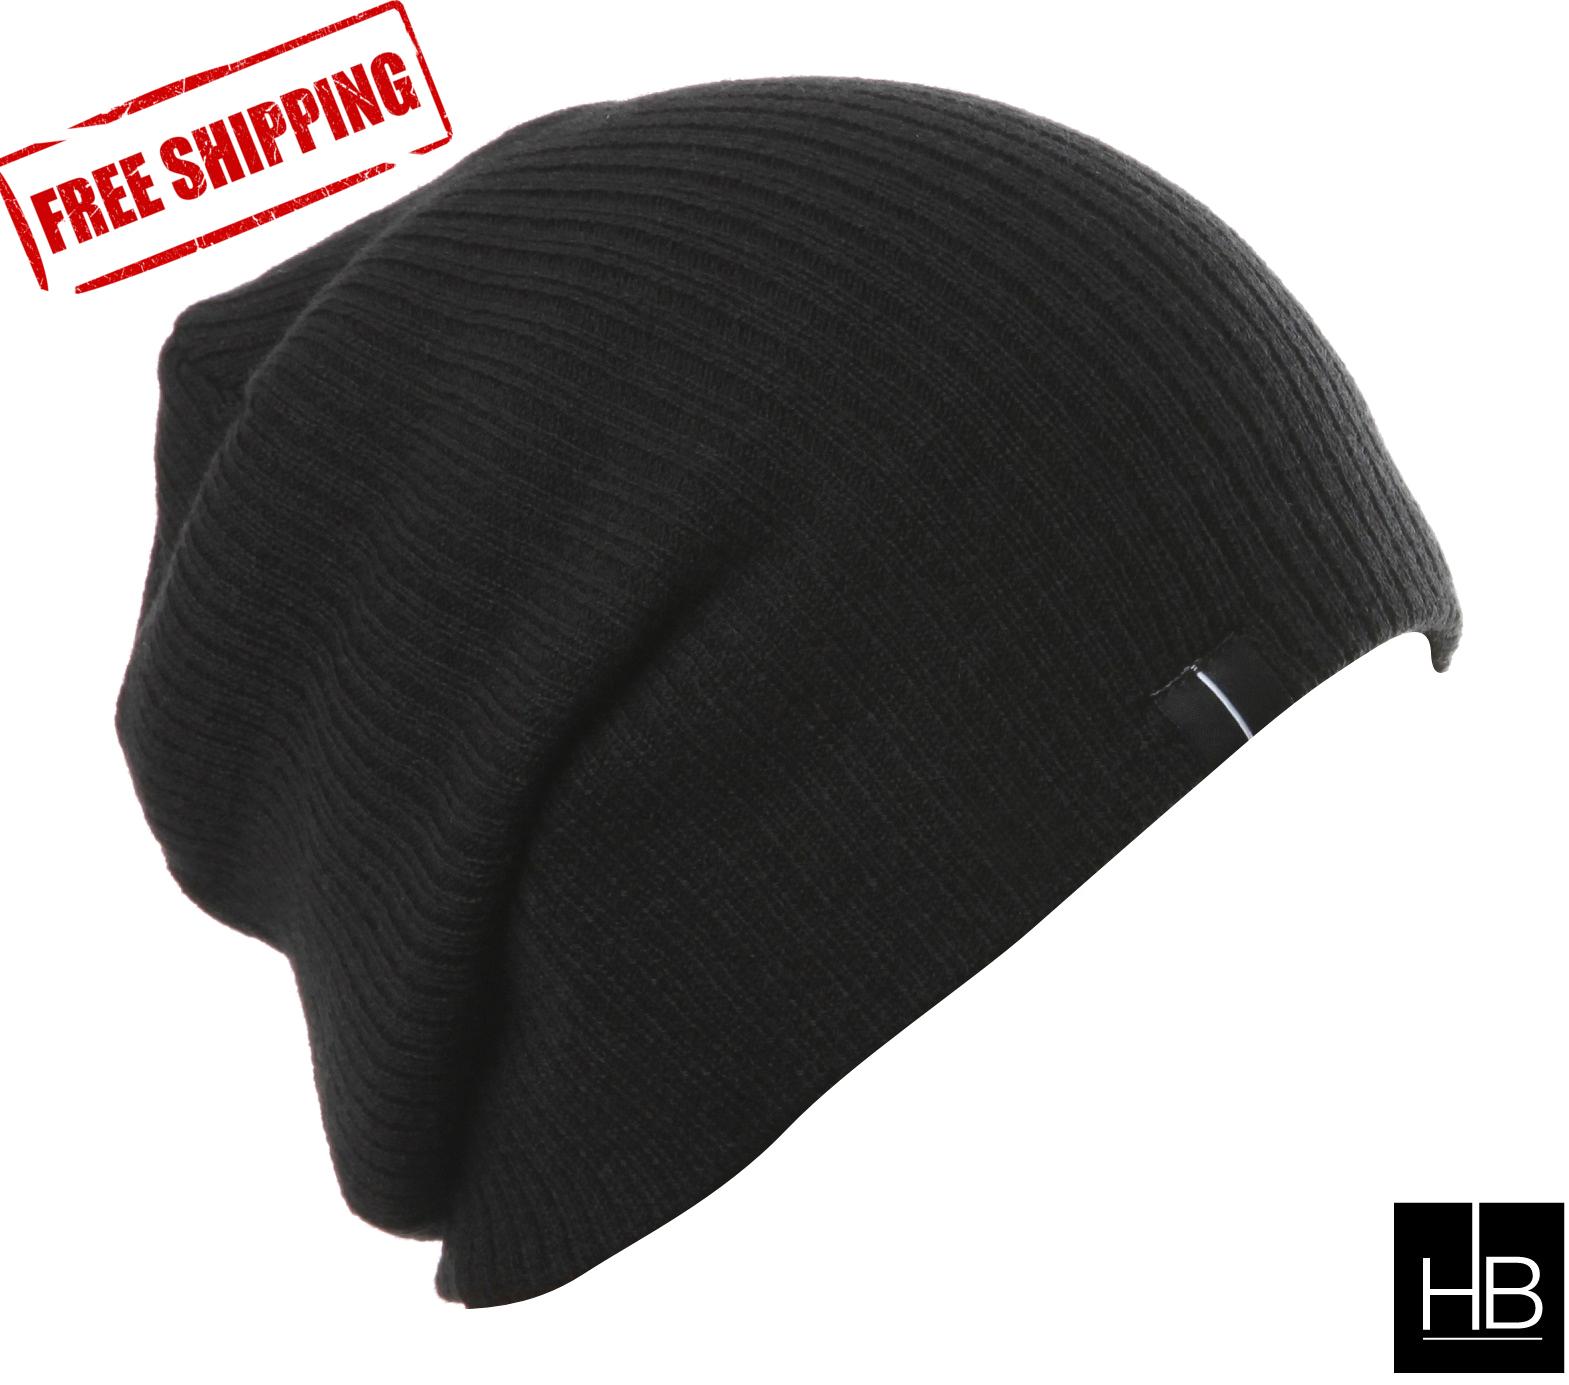 31e7eefd Slouchy Beanie Slouch Skull Hat Ski Hat Snowboard Hat Ribbed Beanie Jet  Black HB (TM)